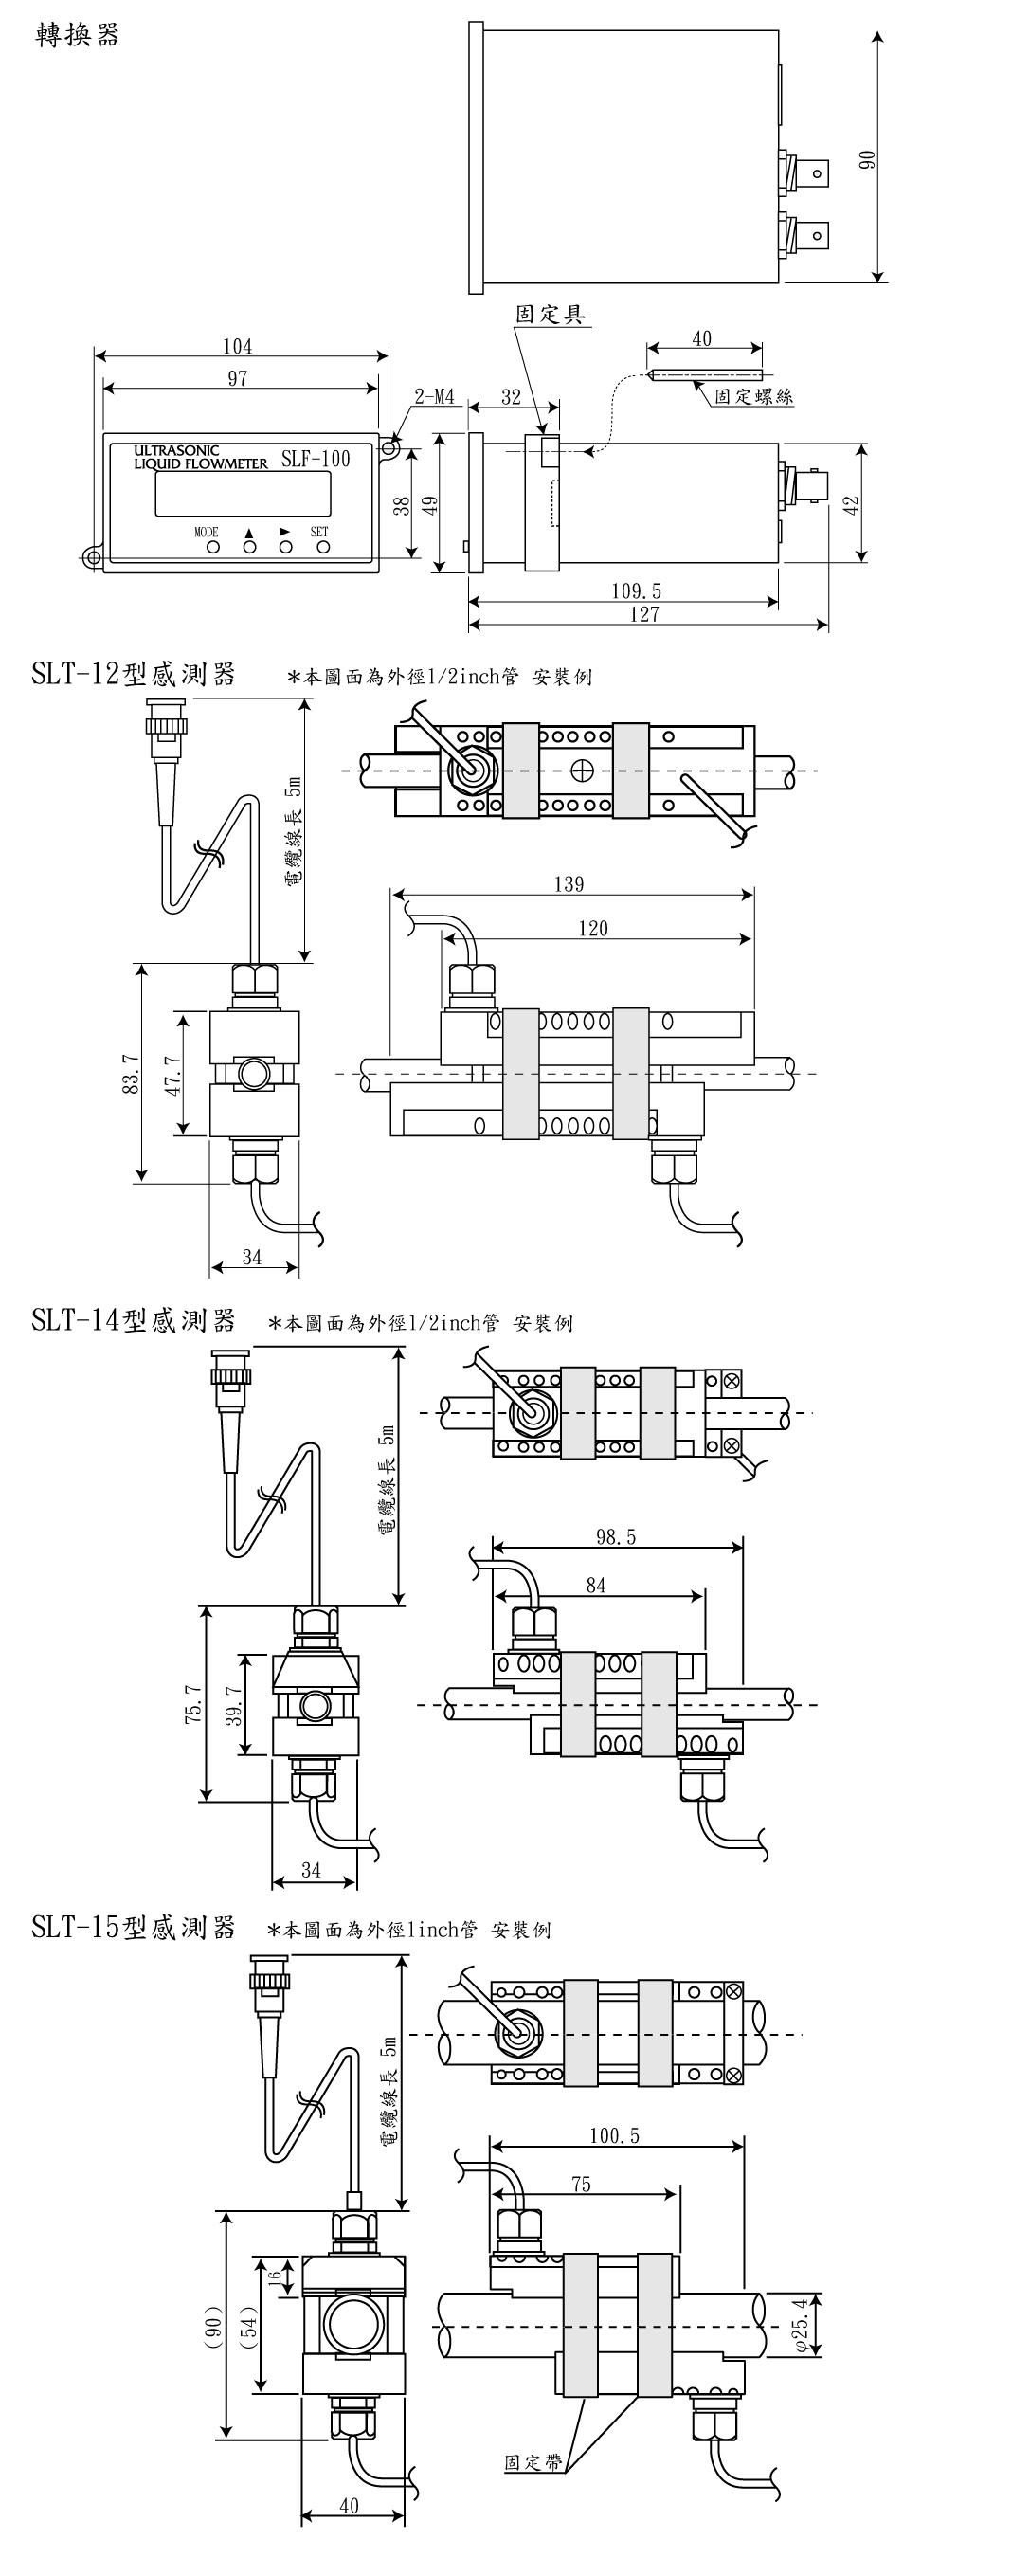 SONIC CORPORATION_ 超音波液體微流量計_ 產品介紹SLF-100 平面尺寸圖